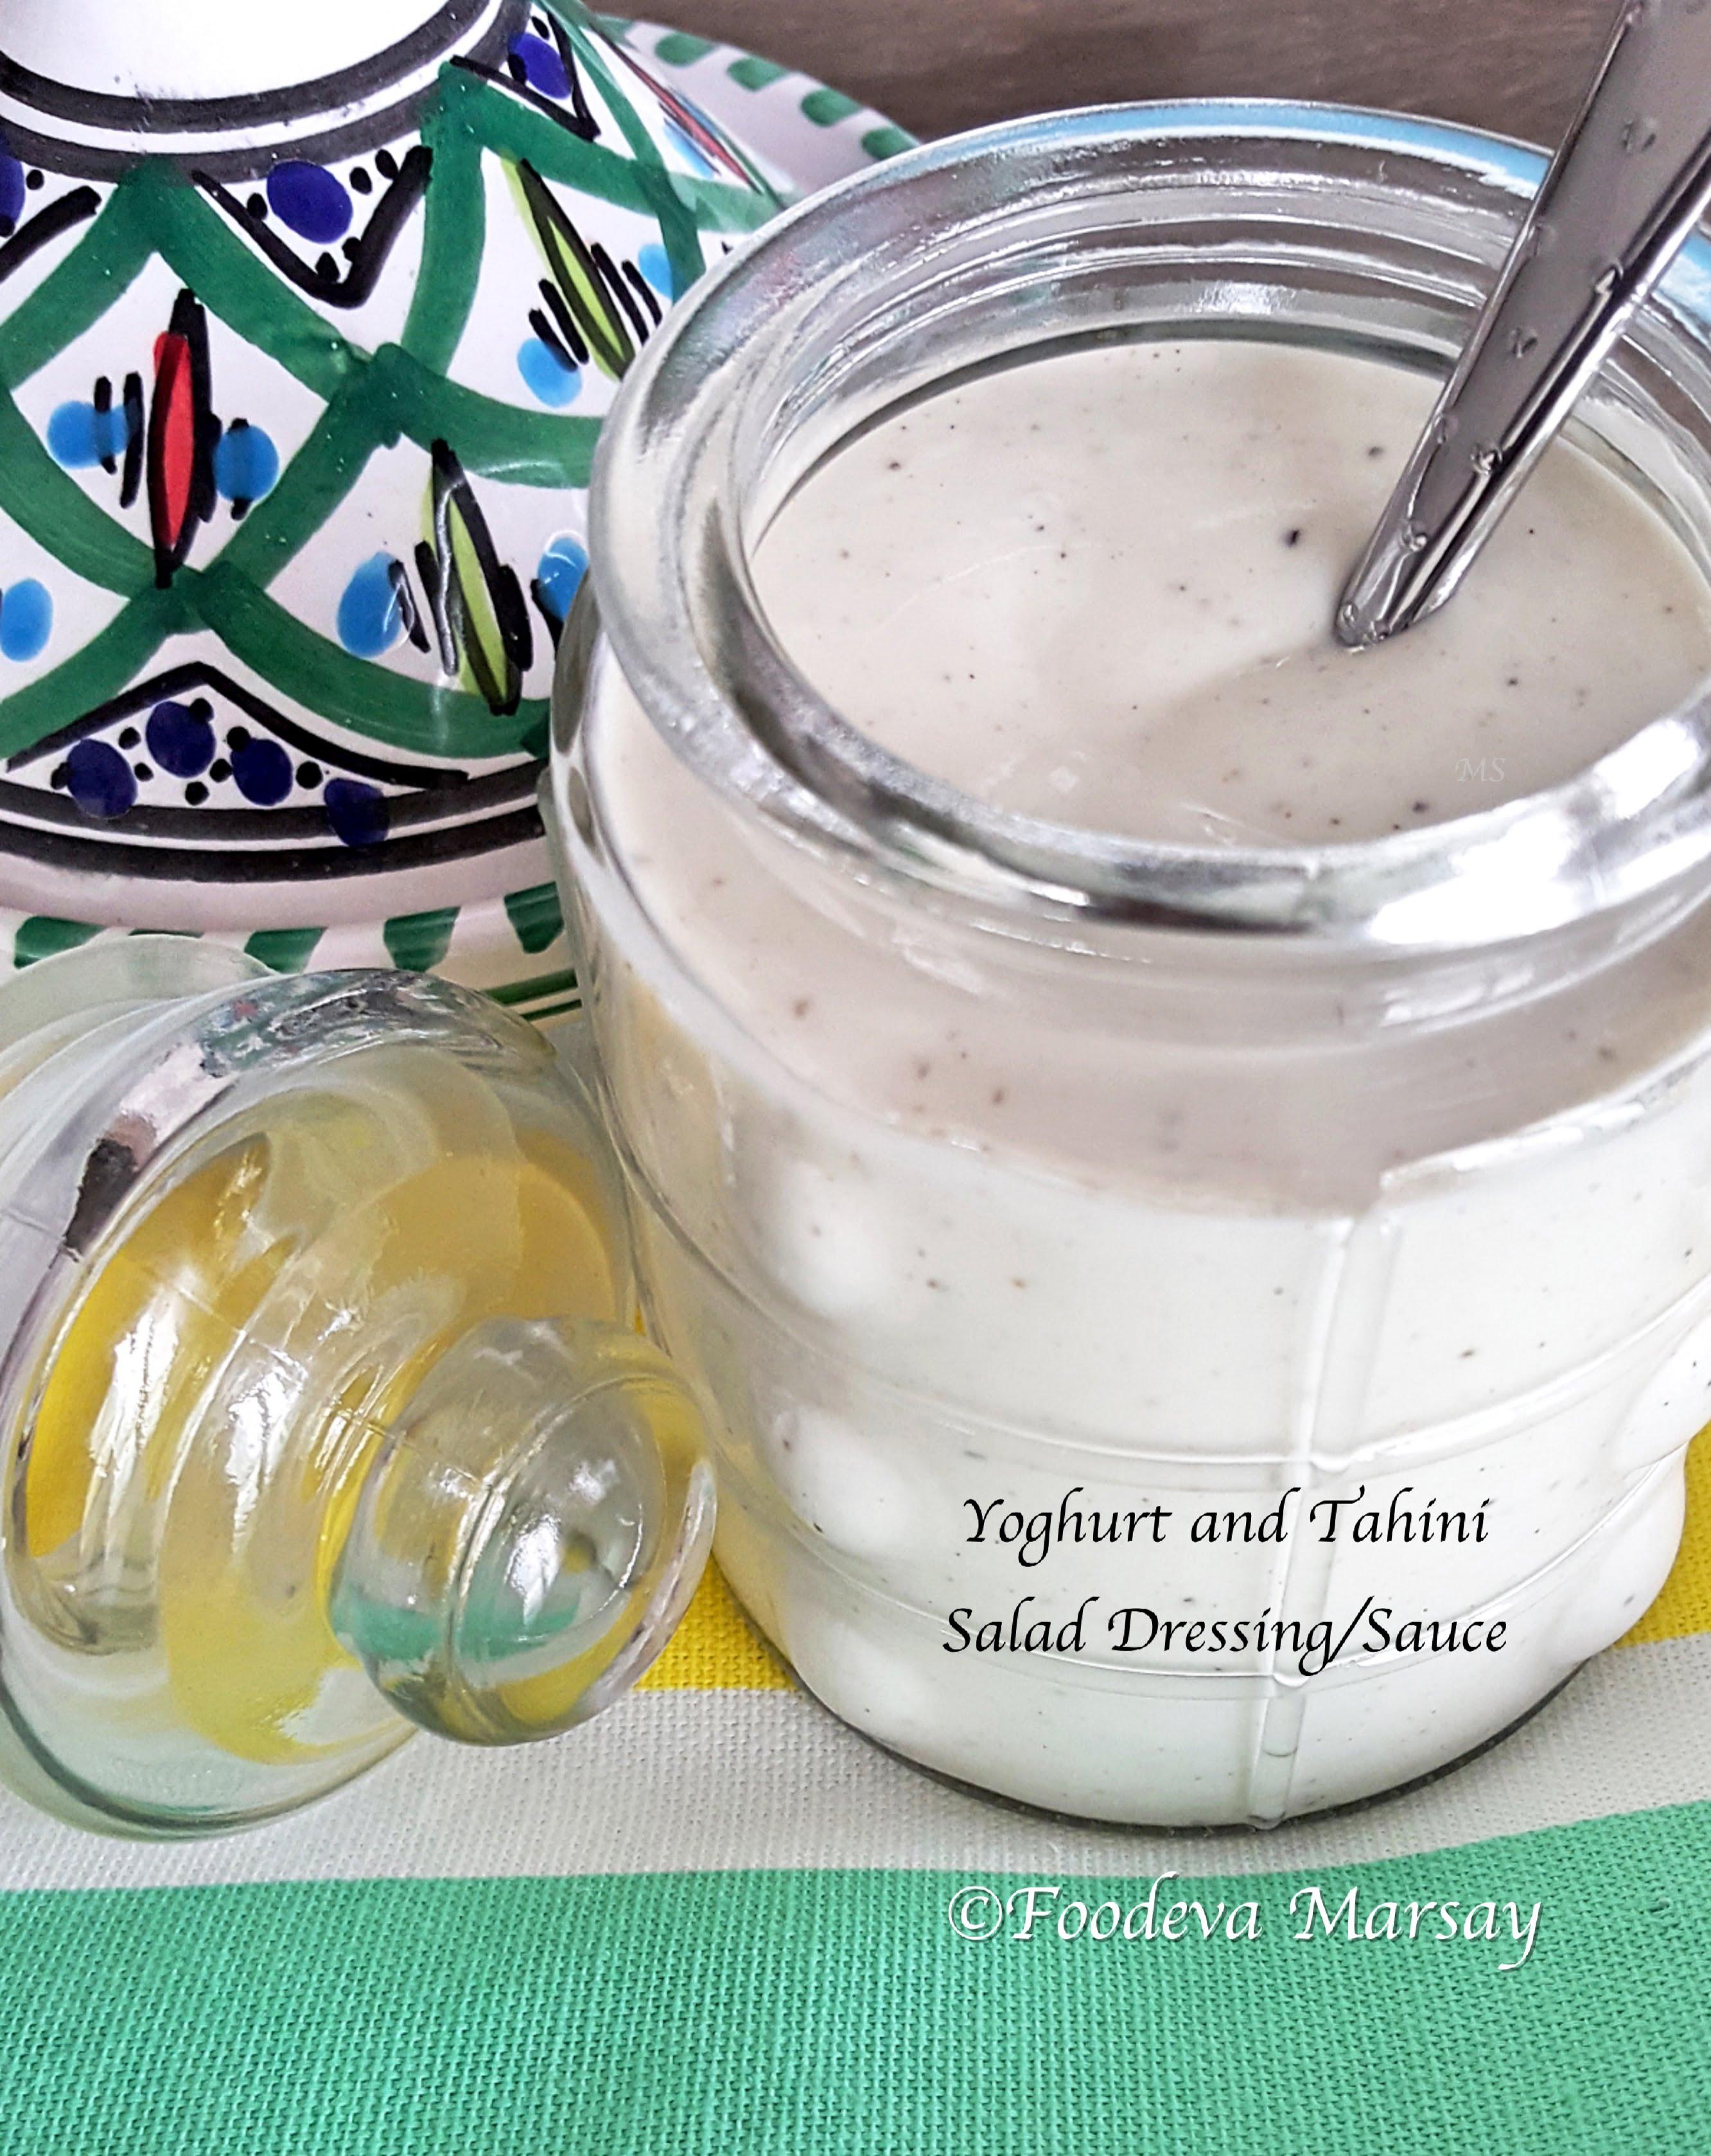 MY RECENT FAV? Yoghurt and Tahini Dressing/Sauce